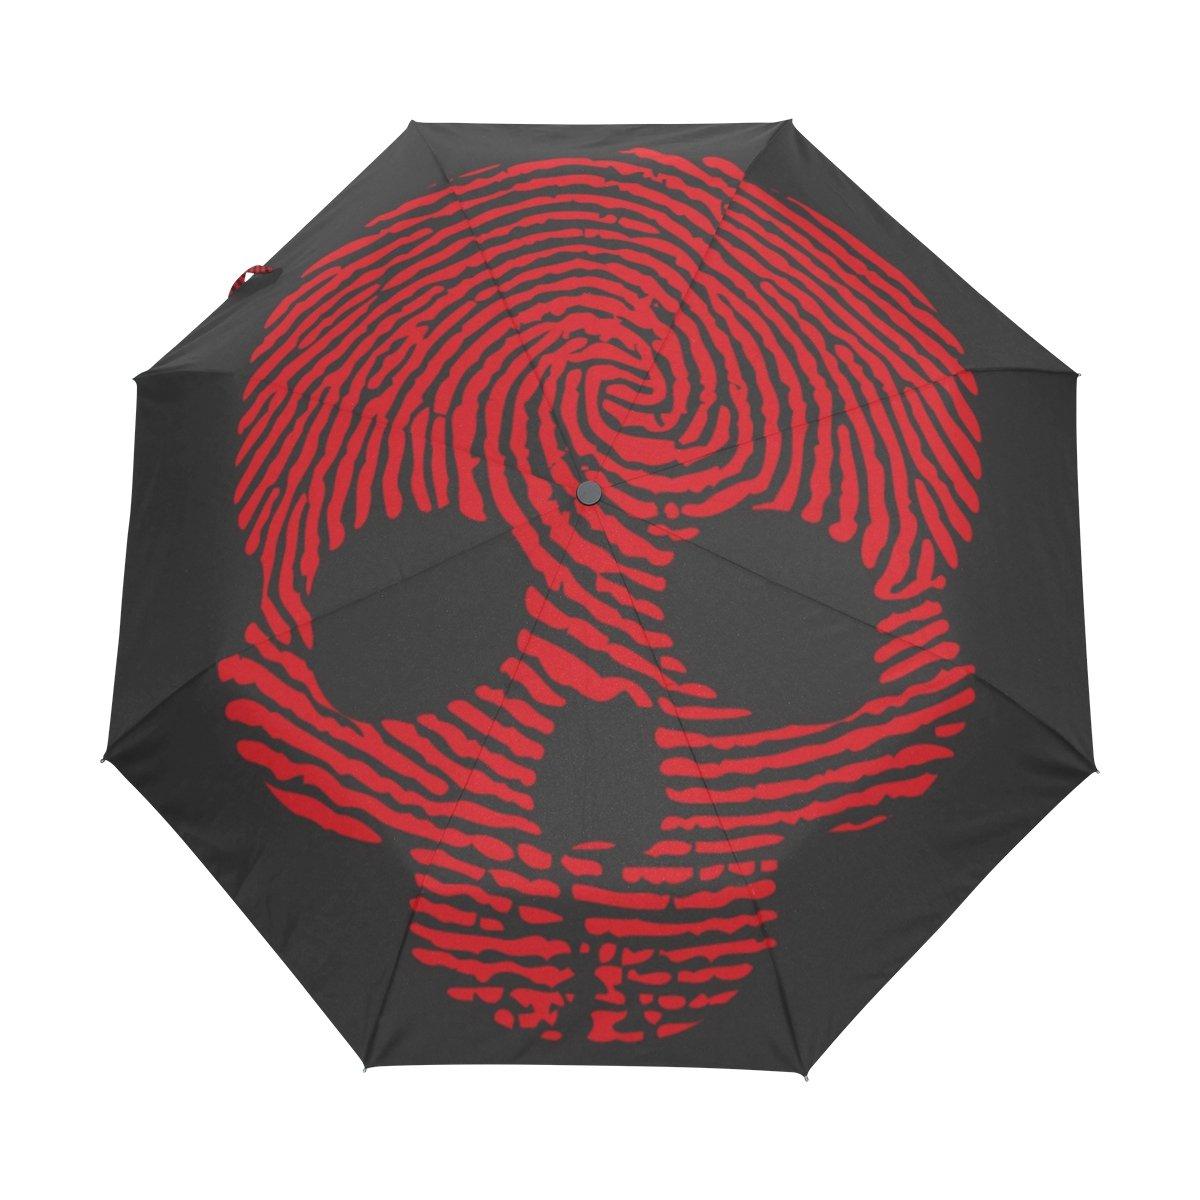 Naanle Red Finger Print Skull Skeleton Auto Open Close Foldable Travel Umbrella